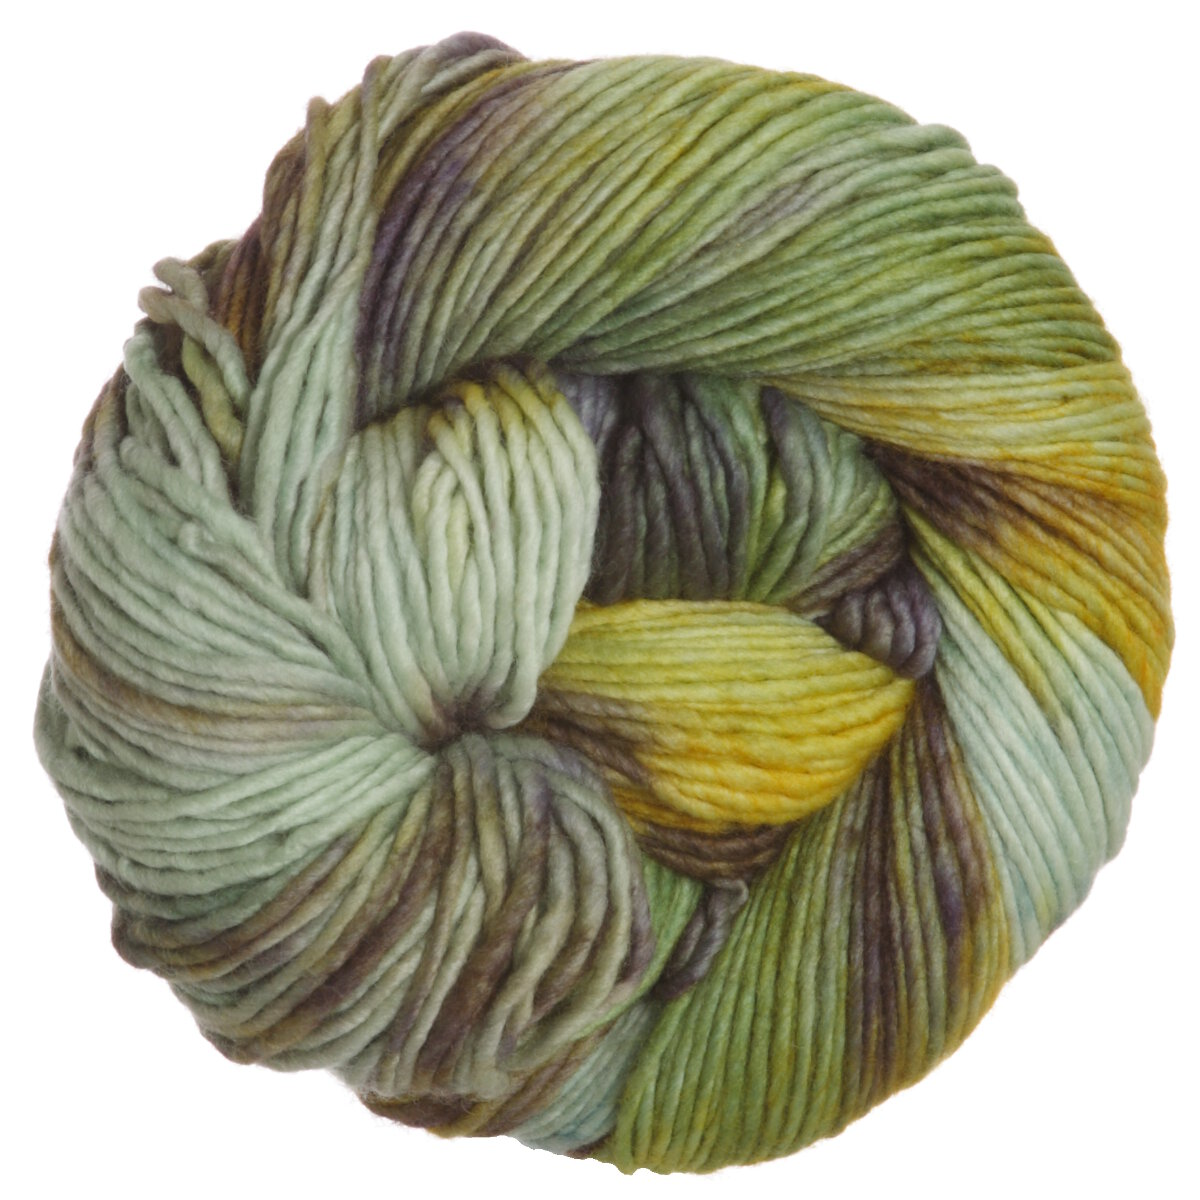 Worsted Yarn : Malabrigo Worsted Merino Yarn - 125 - Mariposa at Jimmy Beans Wool